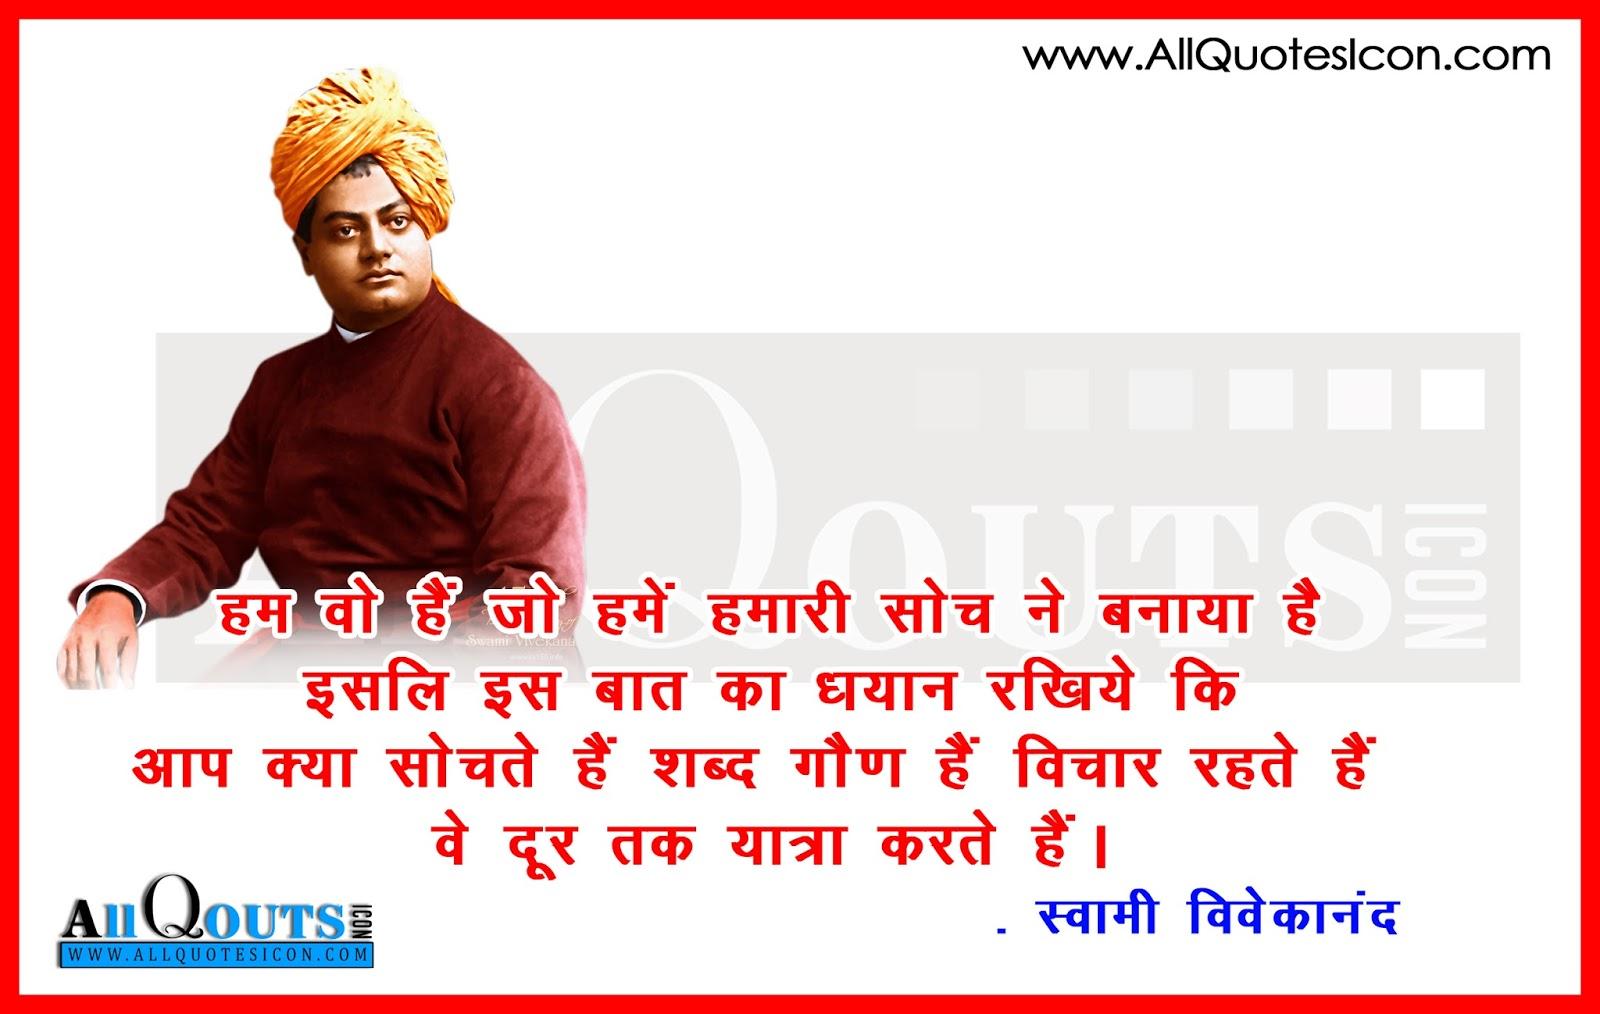 vivekananda shayari and sayings in hindi www